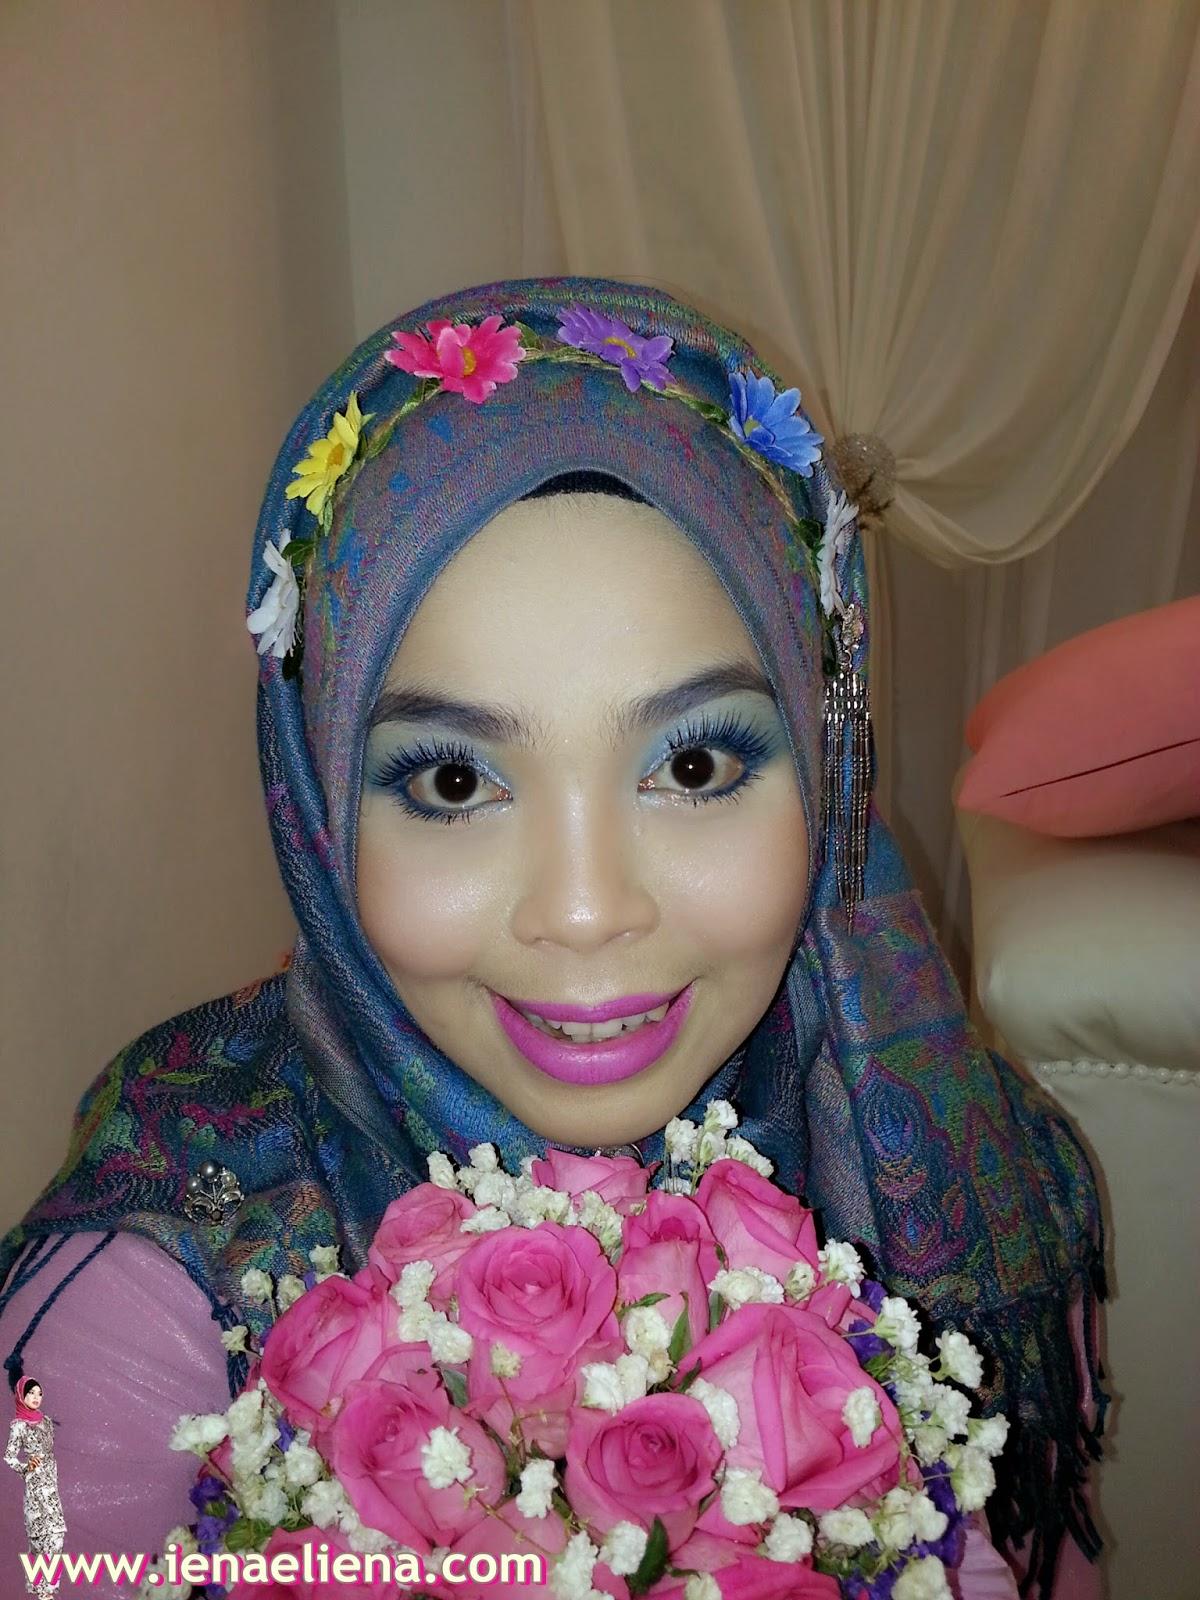 make up by cik iena eliena